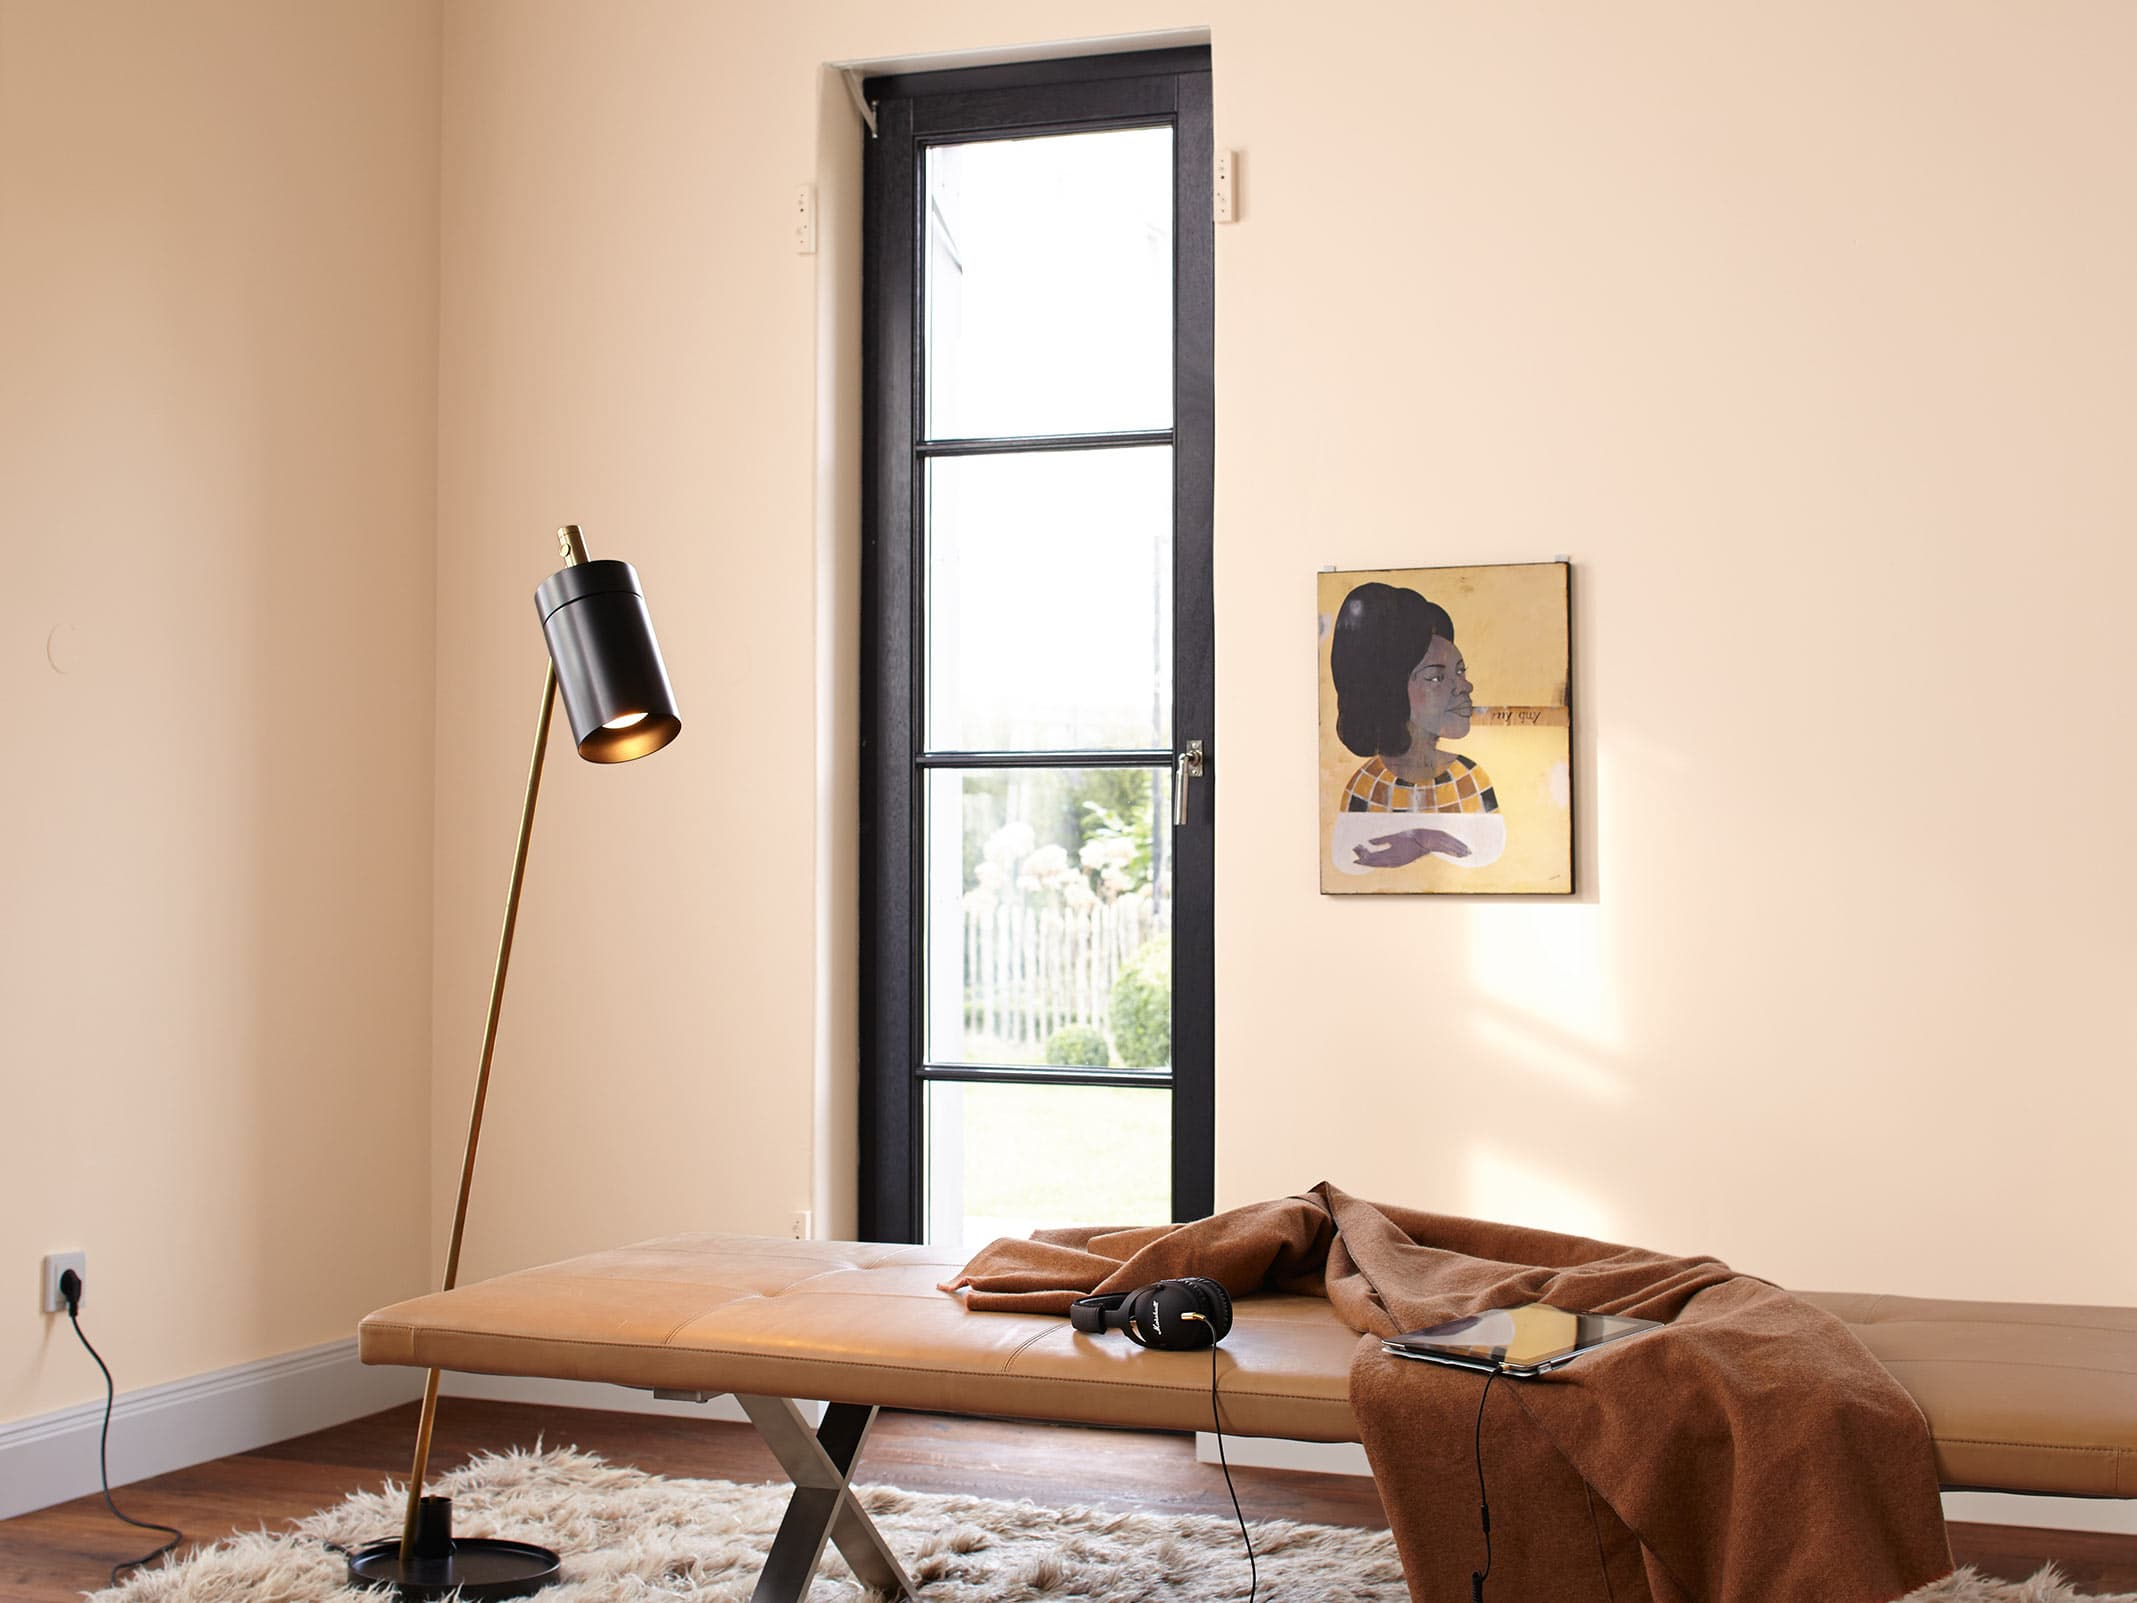 Edelmatte Wandfarben In Premium Qualitt Alpina Feine Farben